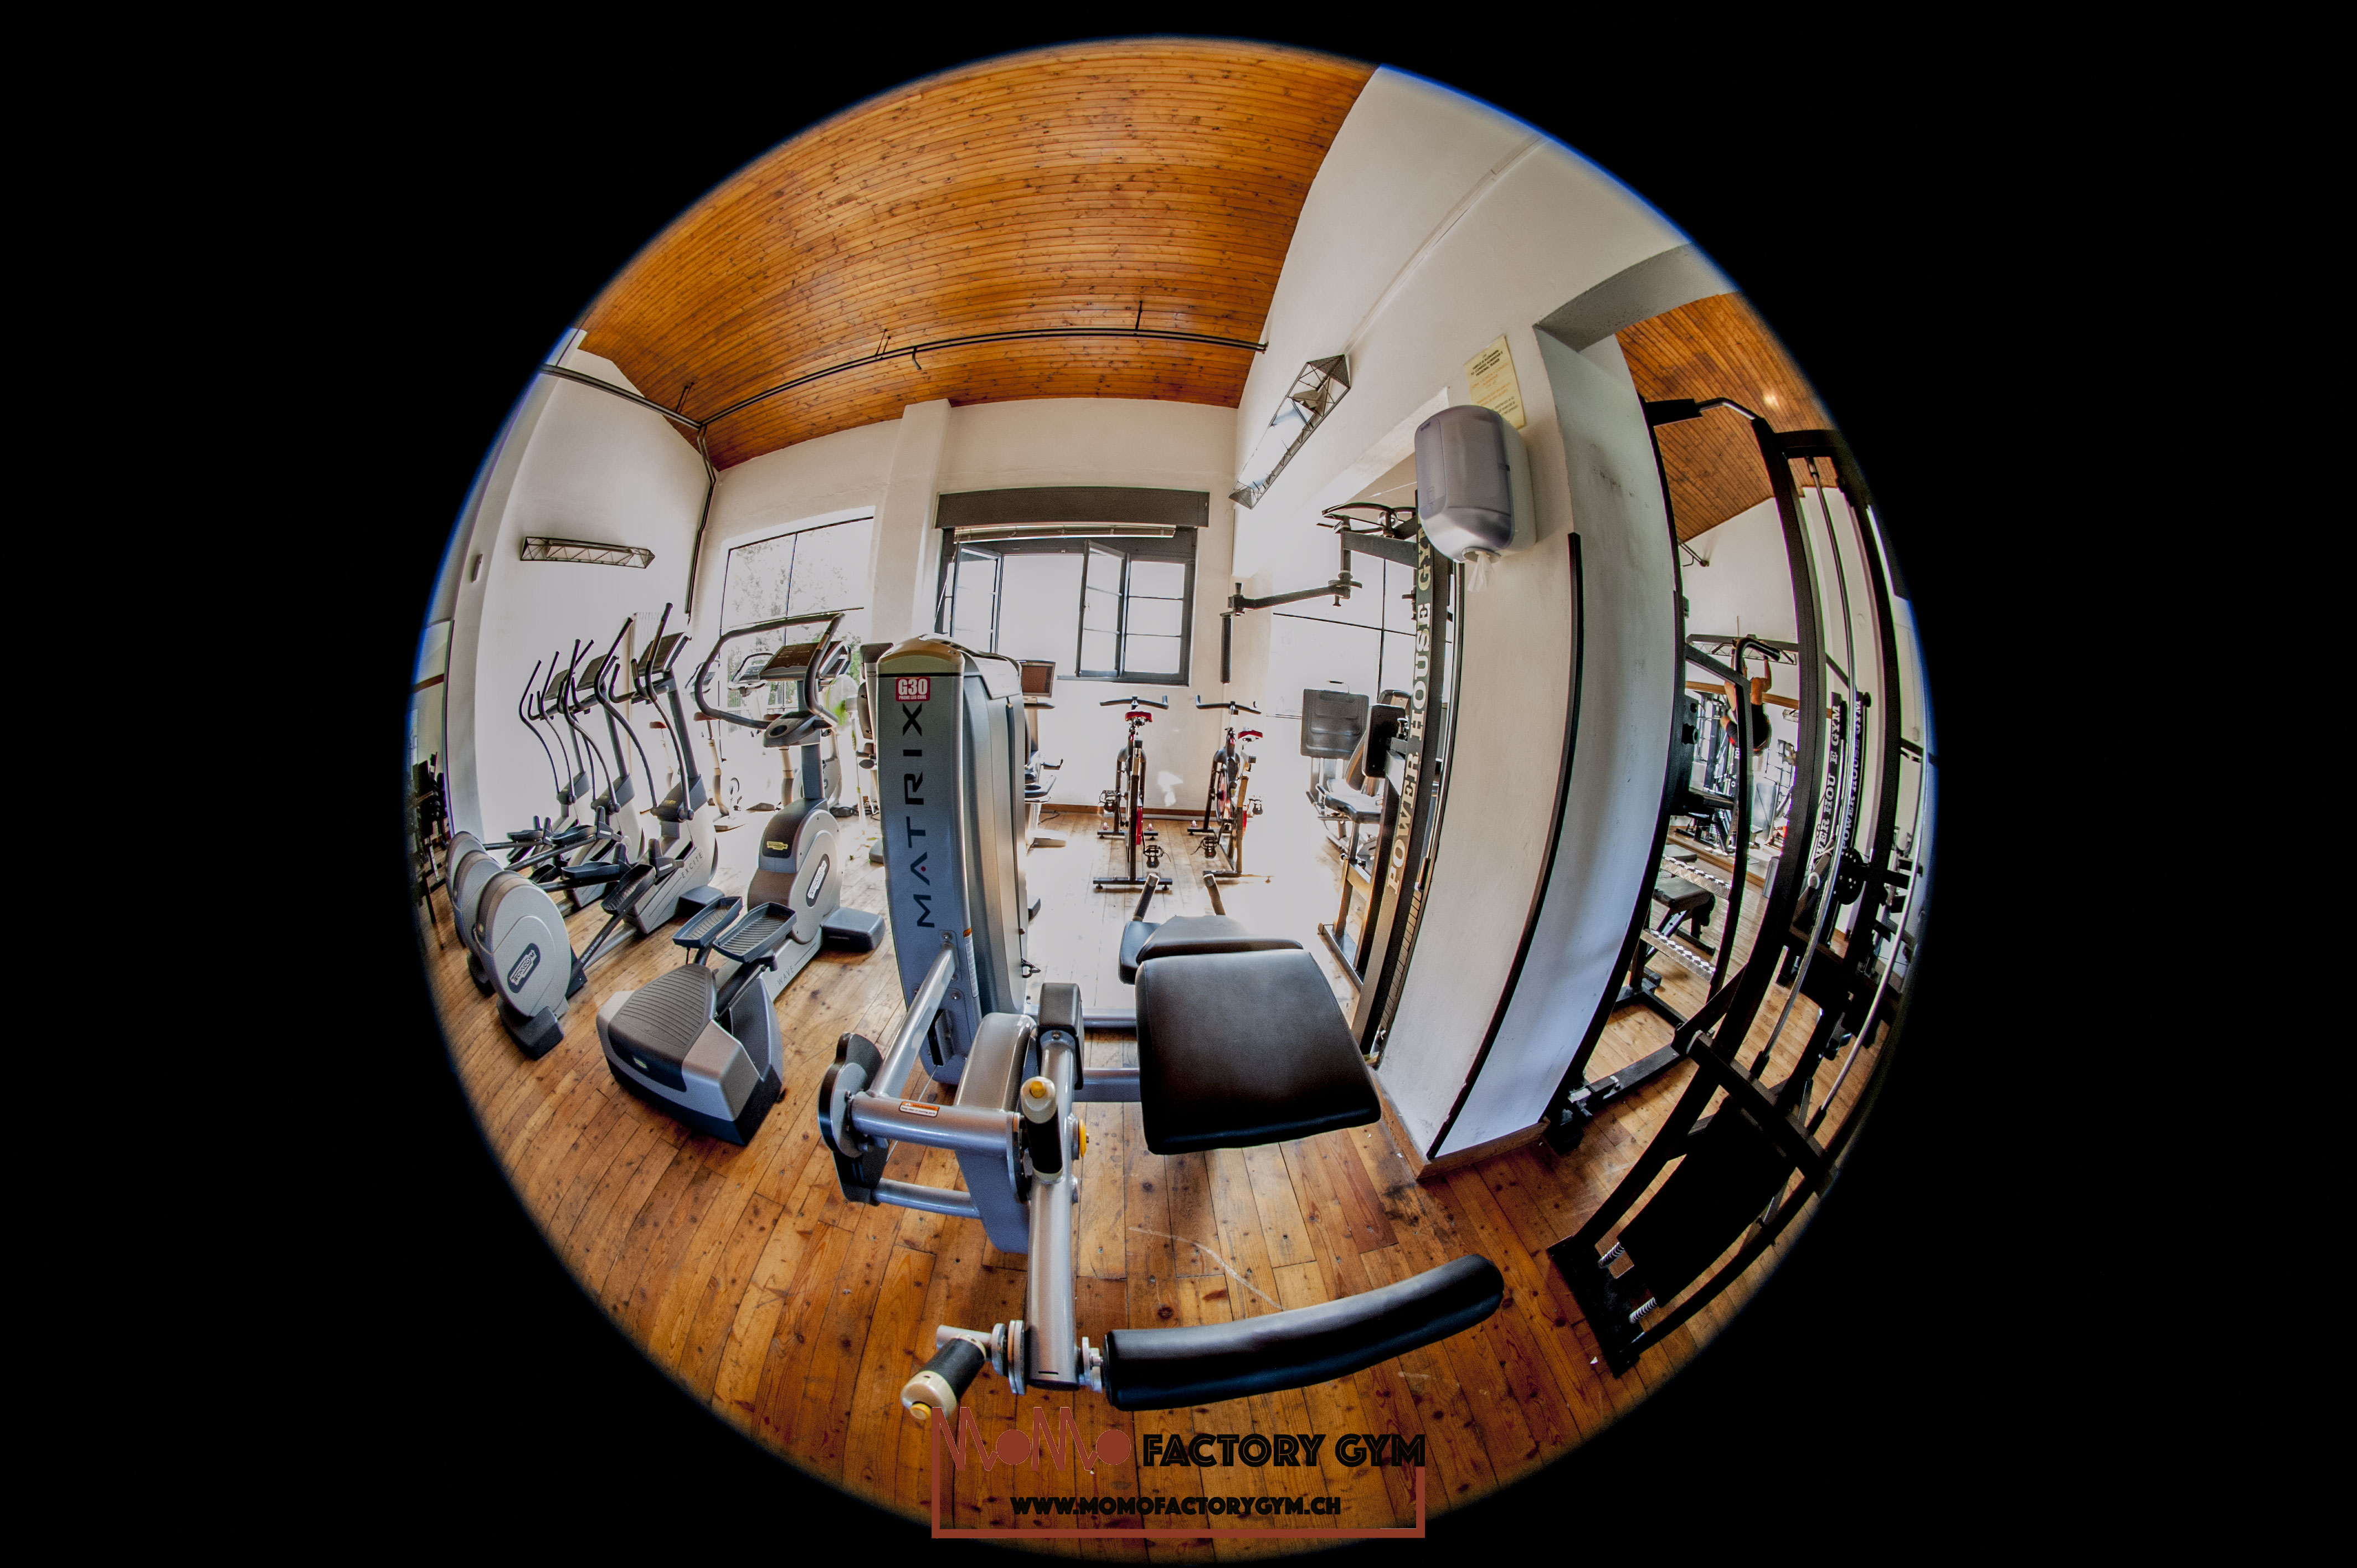 matrix_momo_factory_gym_sala_6